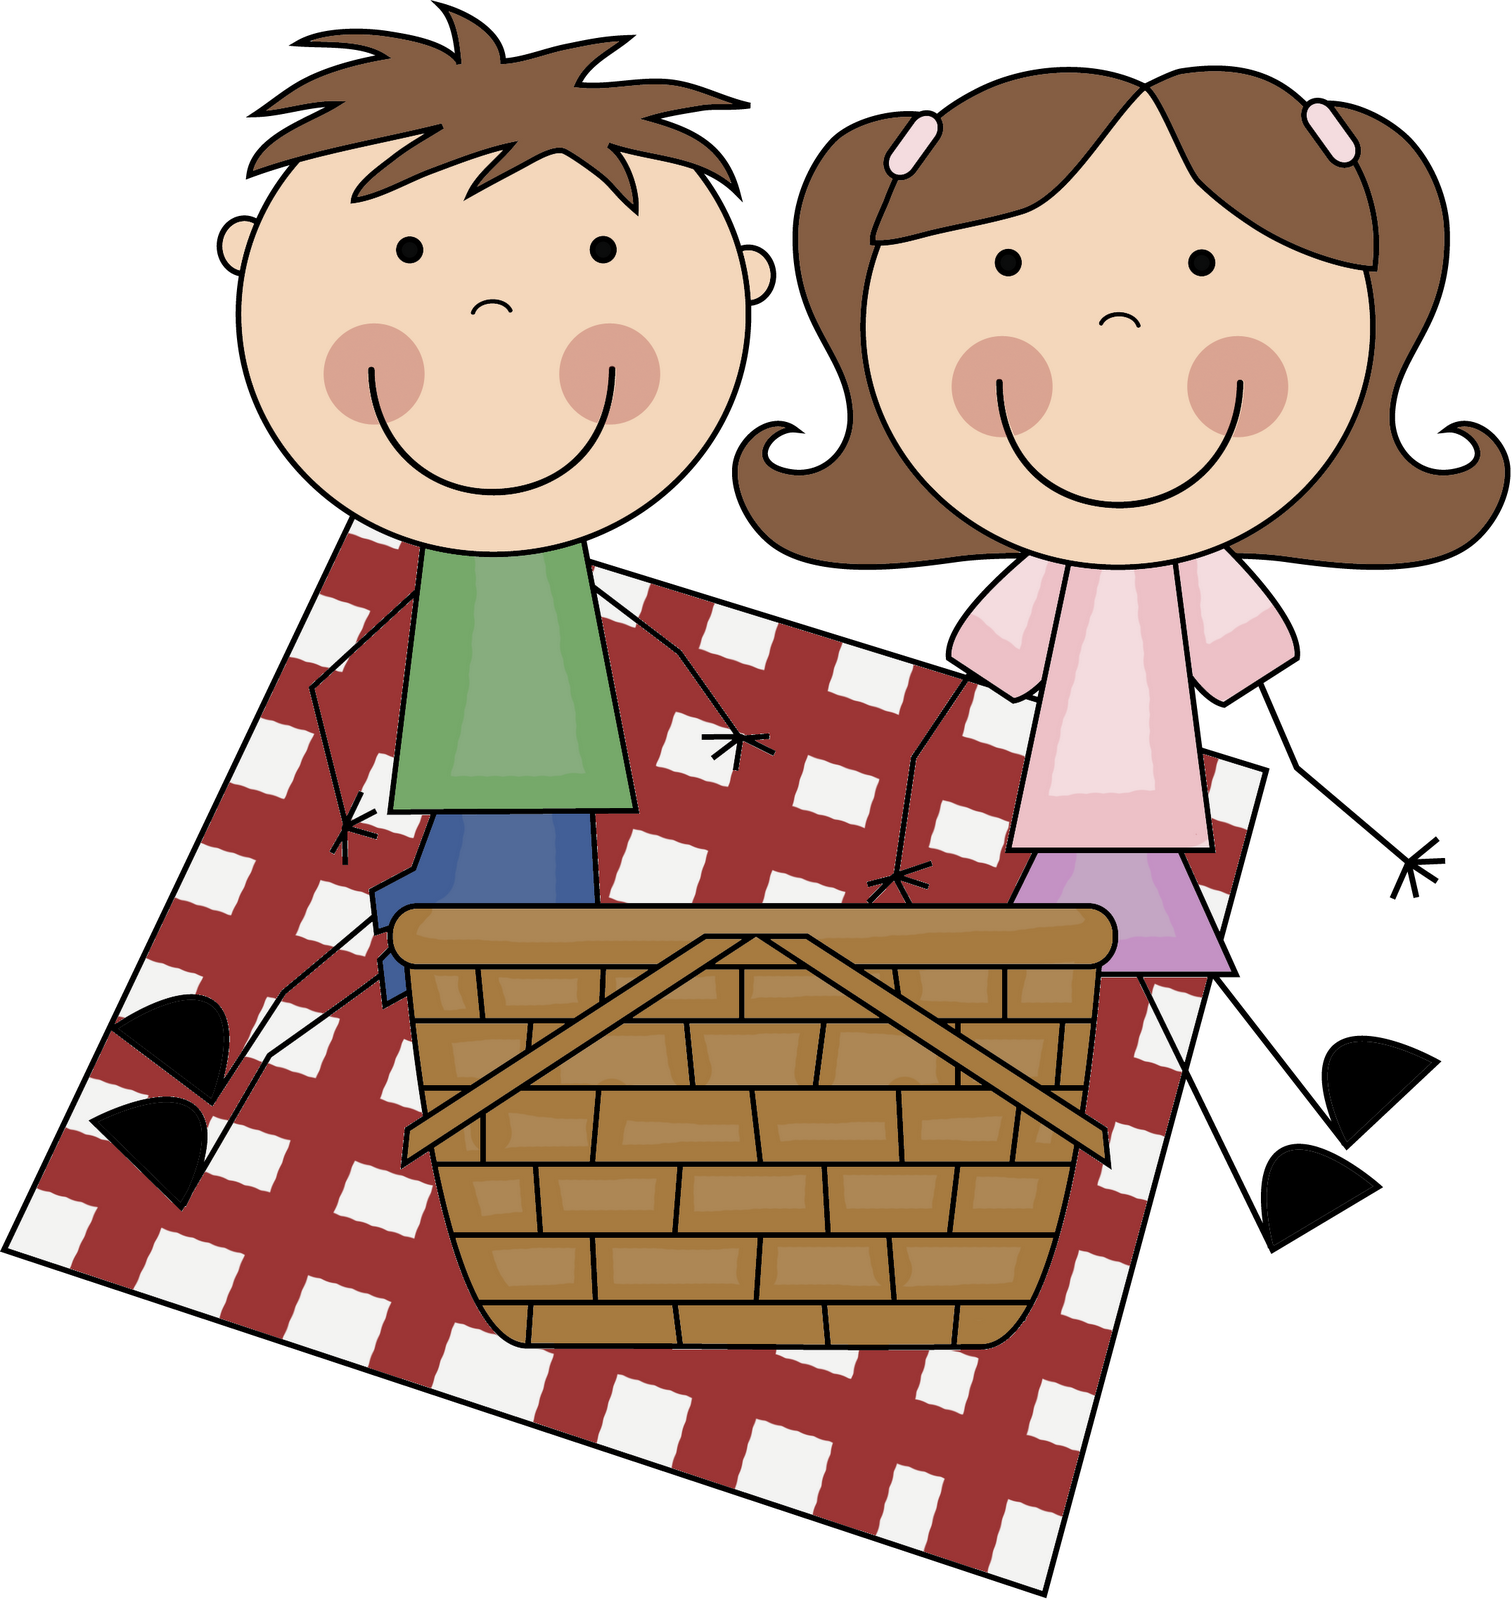 image free download Boarder clipart picnic. Summer borders panda free